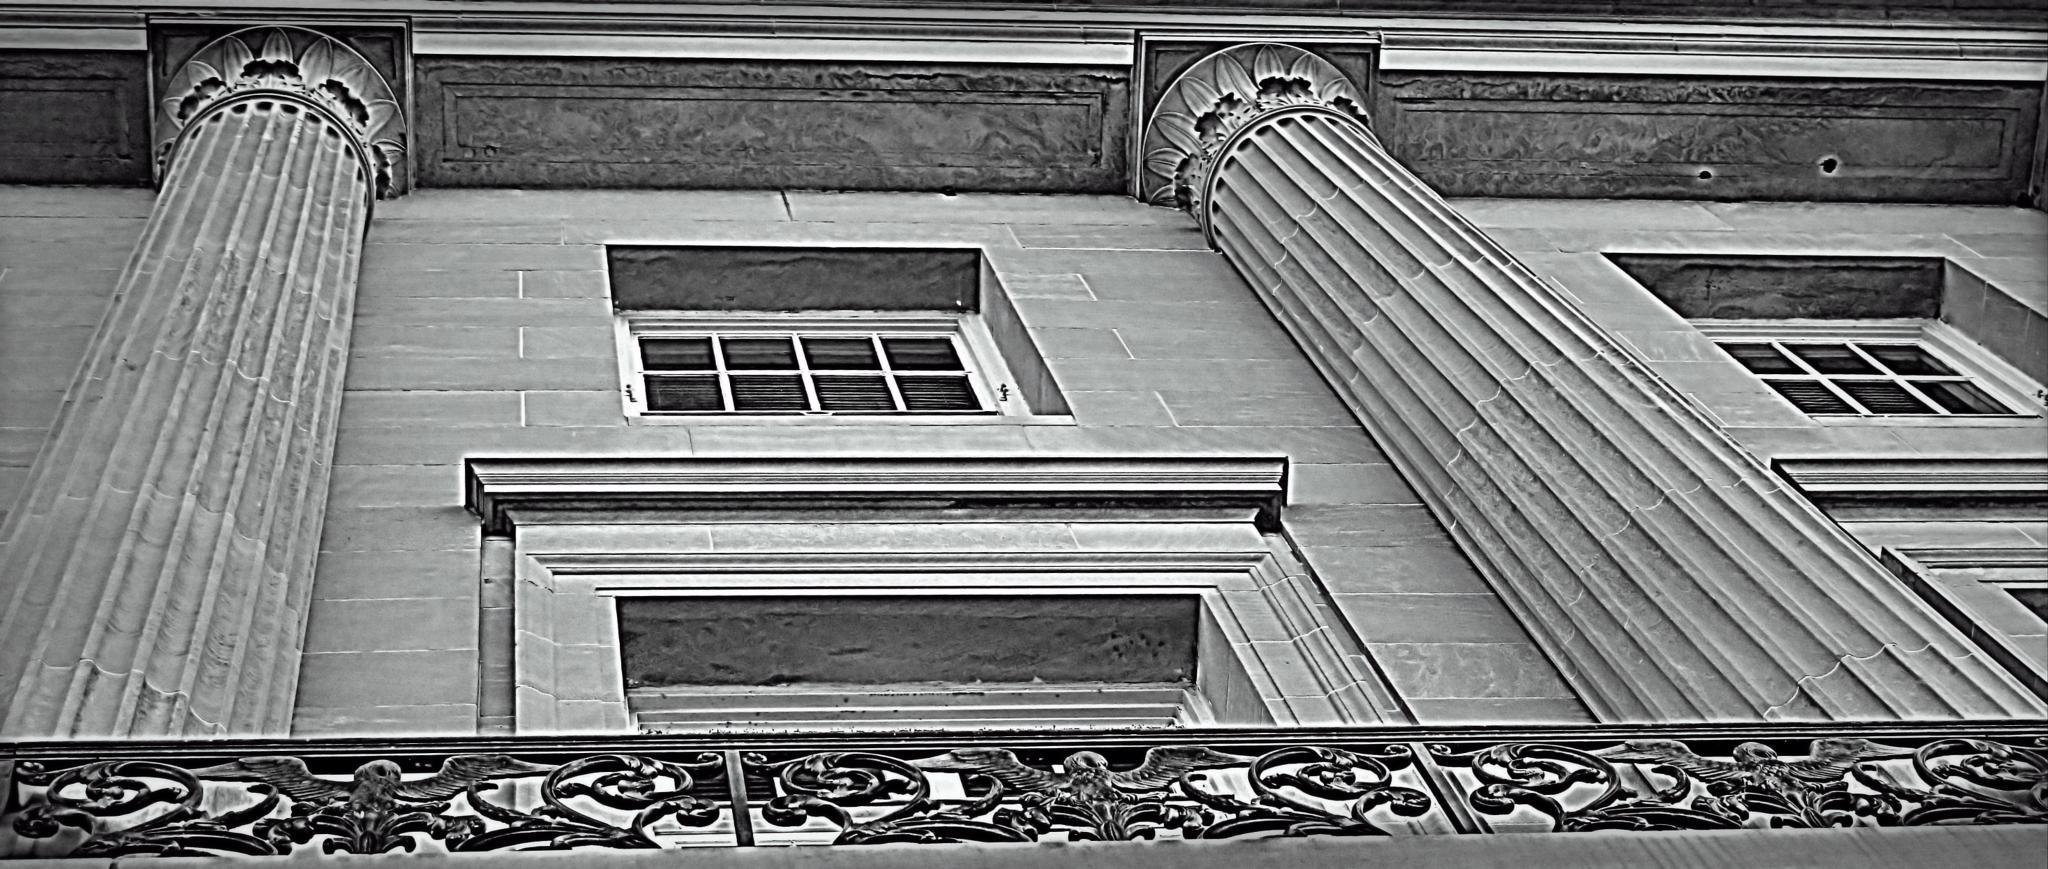 Columns by karen.pearson.184